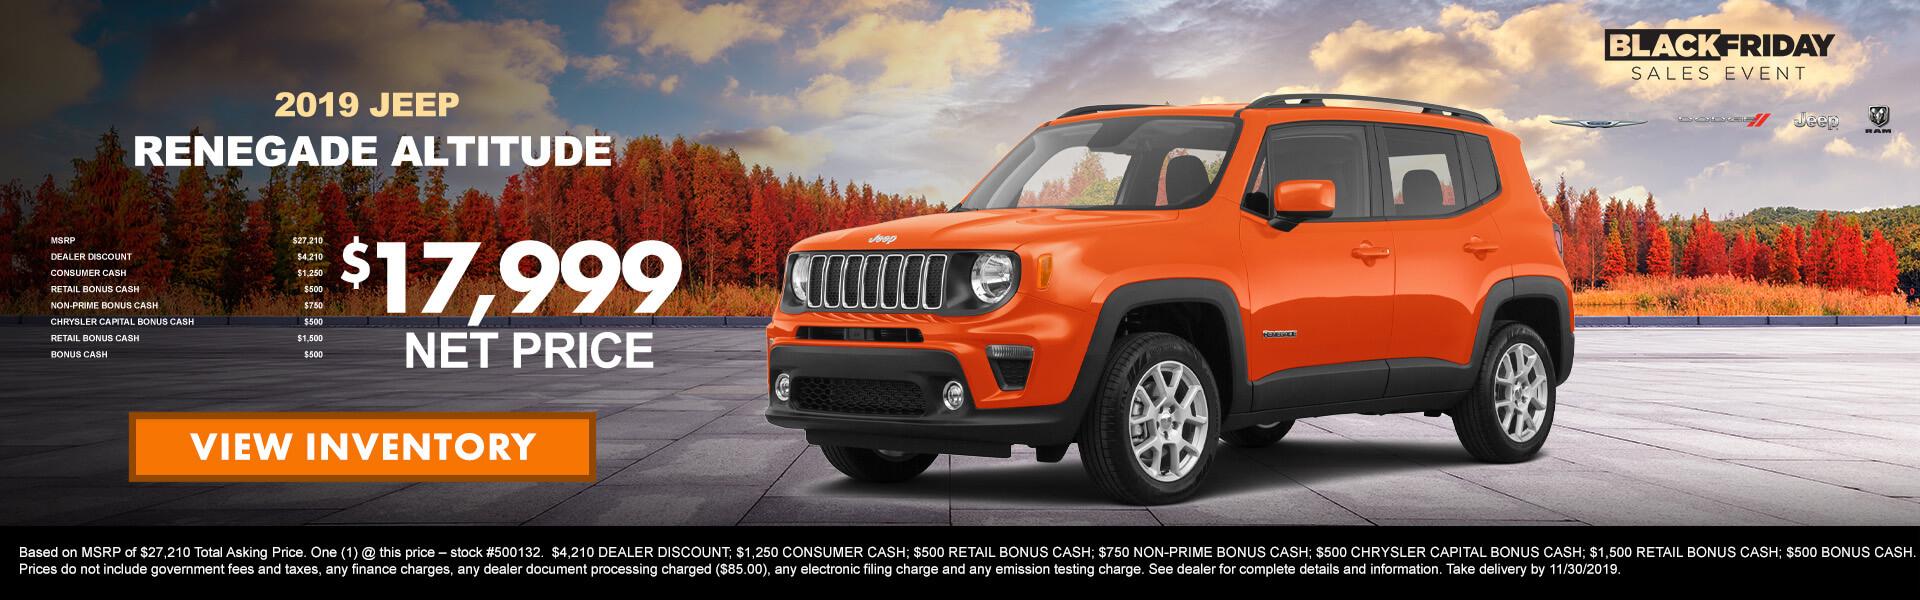 Jeep Renegade 500132